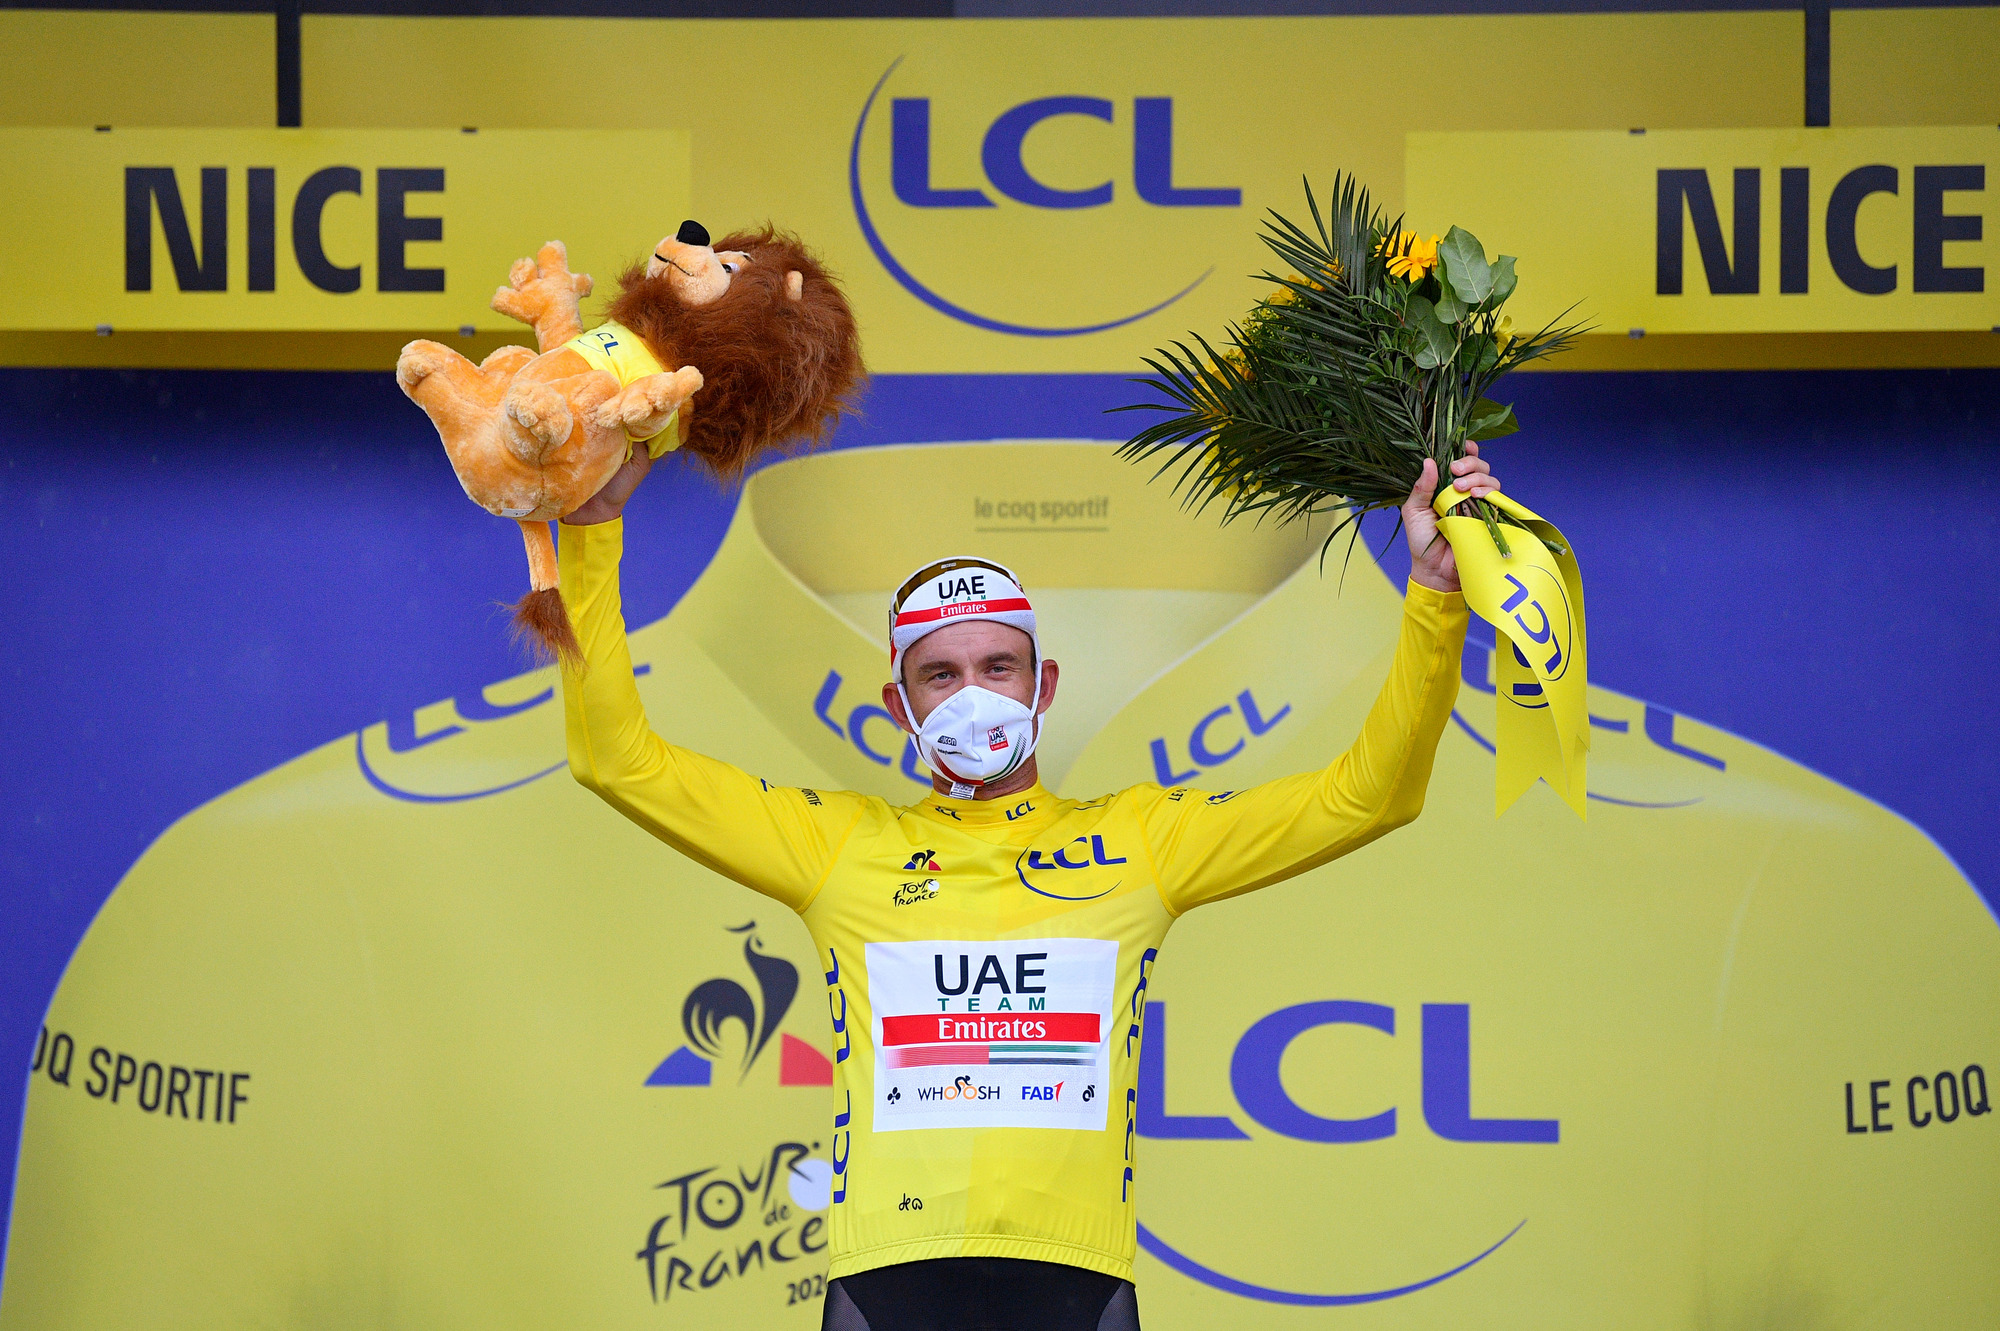 Tour de France 2020 107th Edition 1st stage Nice Nice 156 km 29082020 Alexander Kristoff NOR UAE Team Emirates photo POOL David StockmanBelgaBettiniPhoto2020